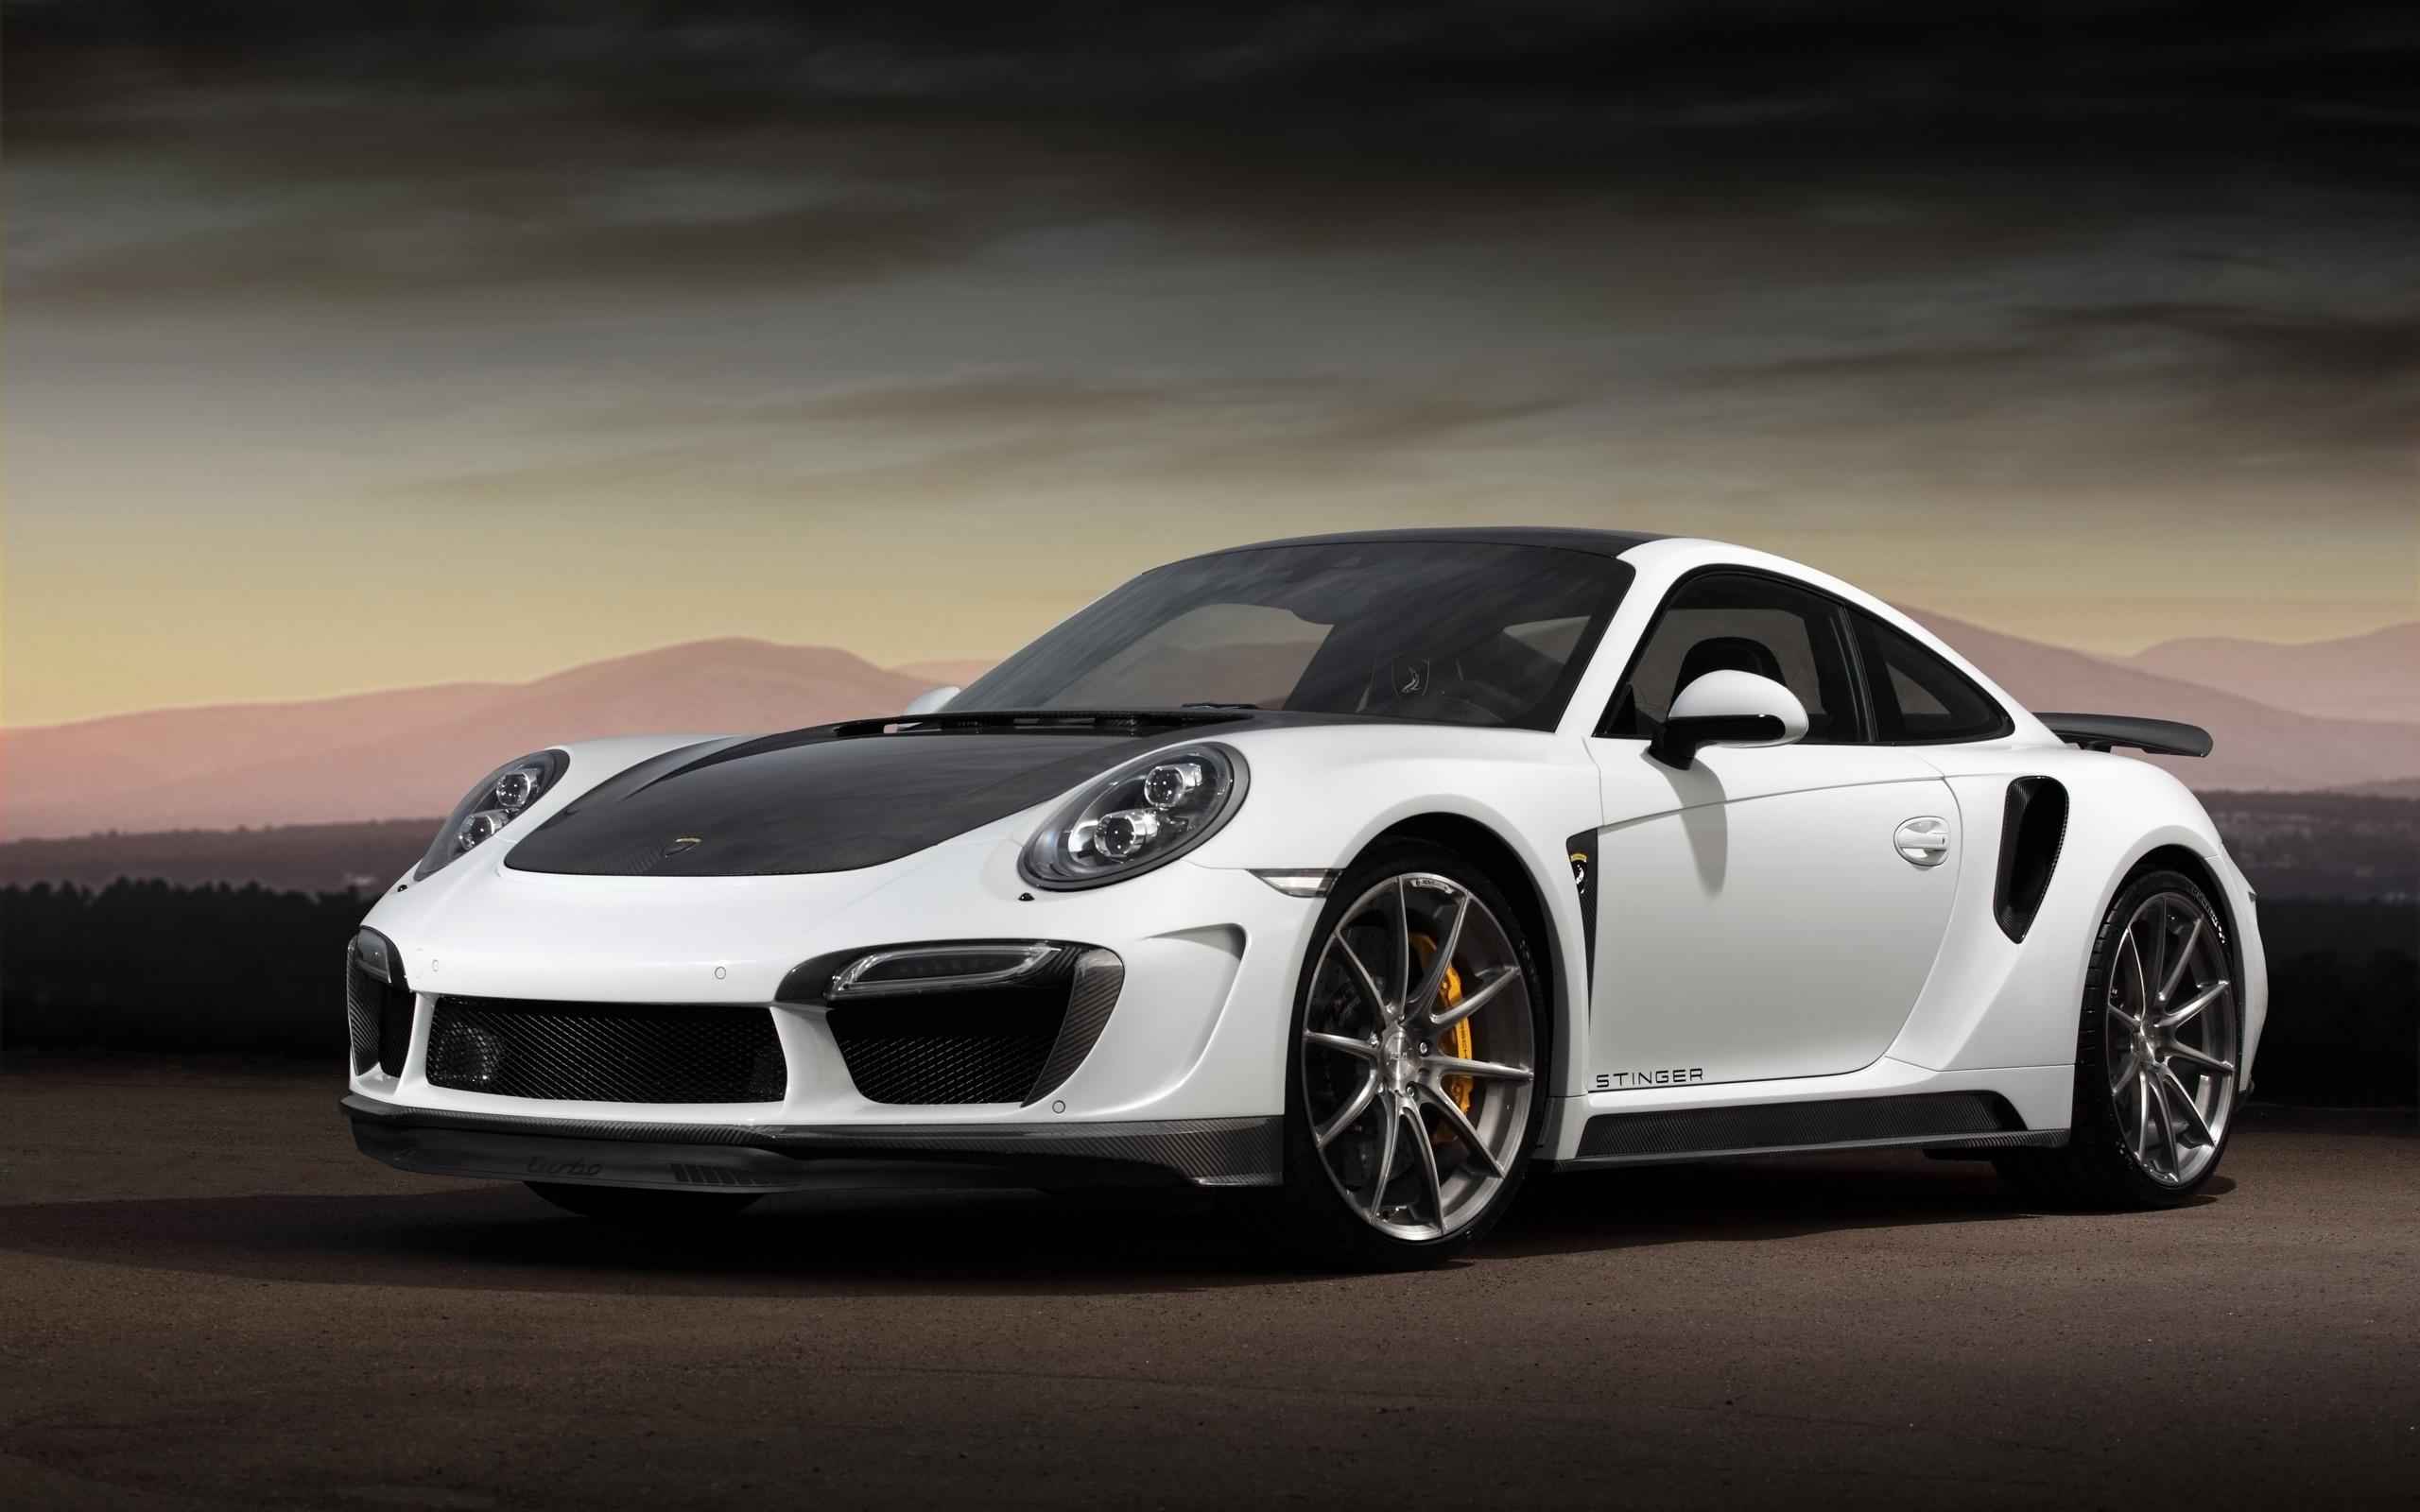 2015 Topcar Porsche 991 Turbo Stinger Gtr Wallpaper Hd Car Wallpapers Id 5011